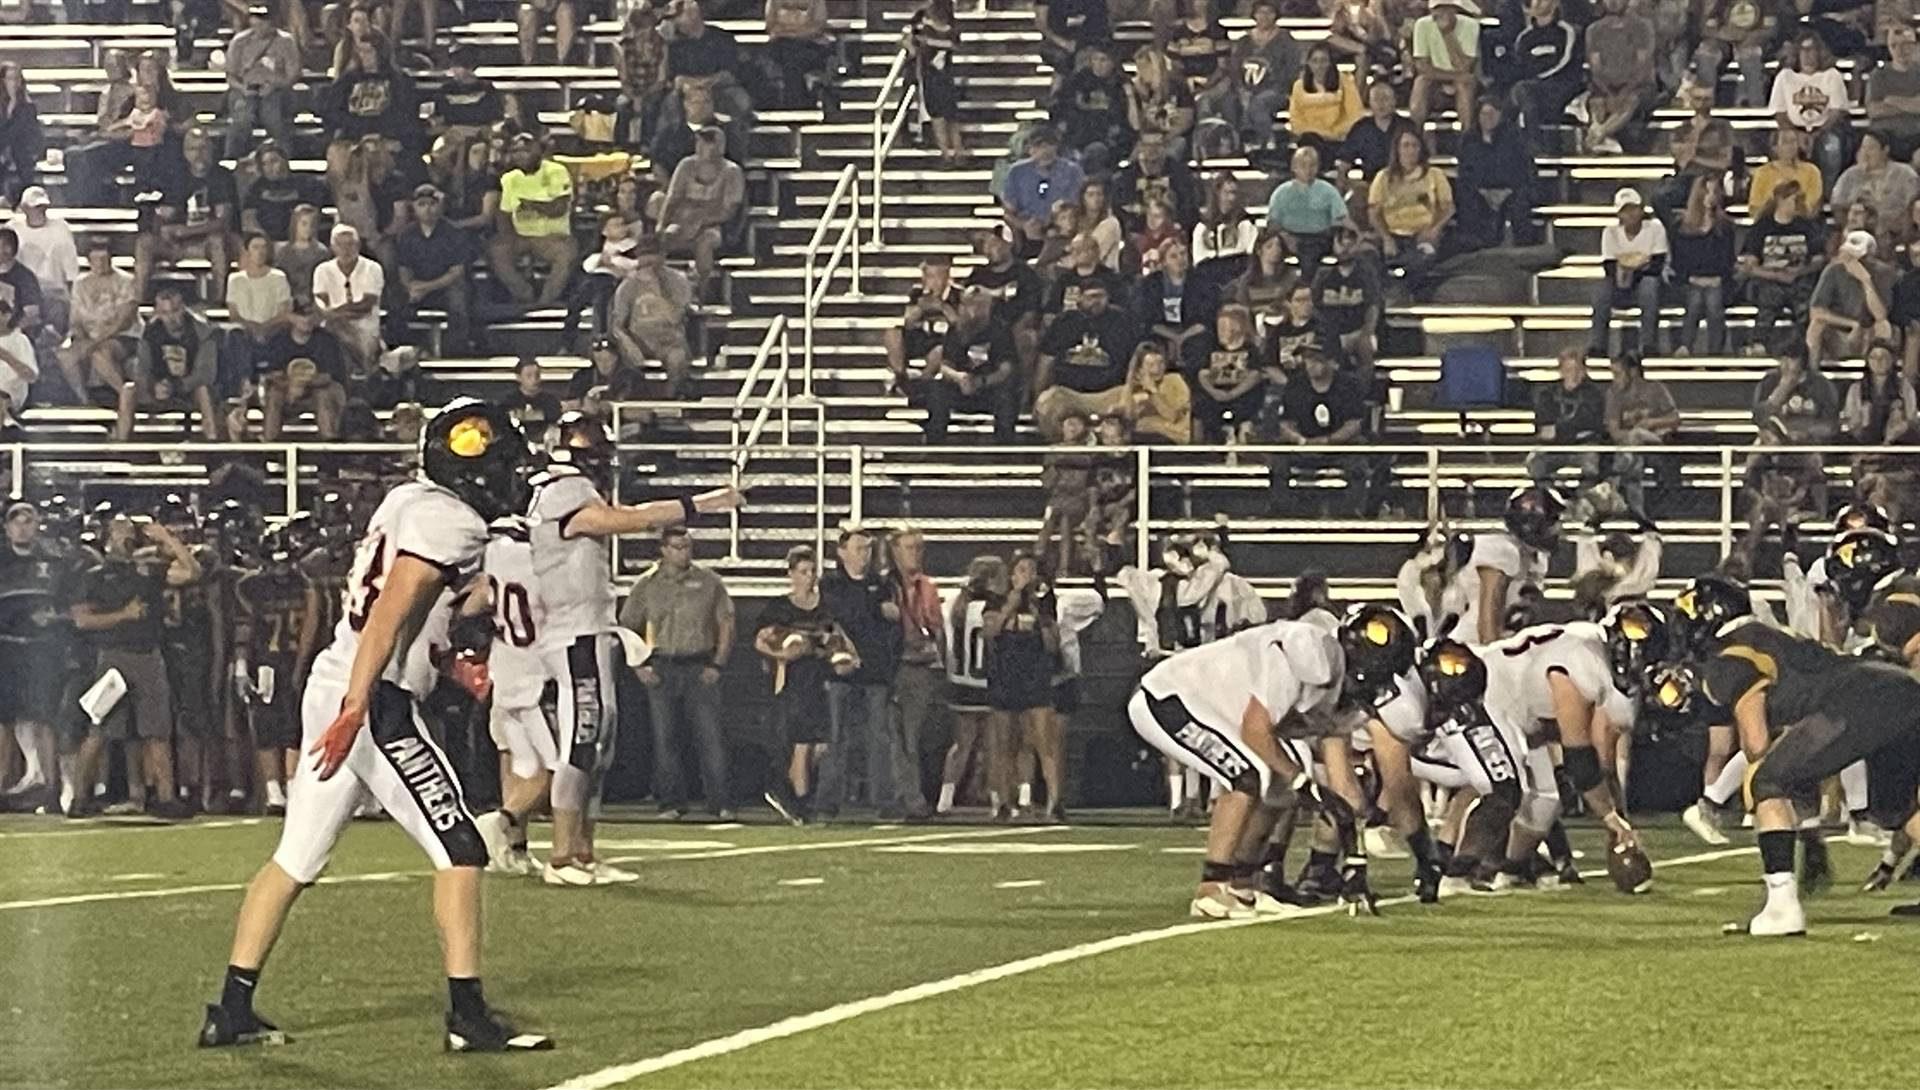 Varsity Football taking on Tri-Valley